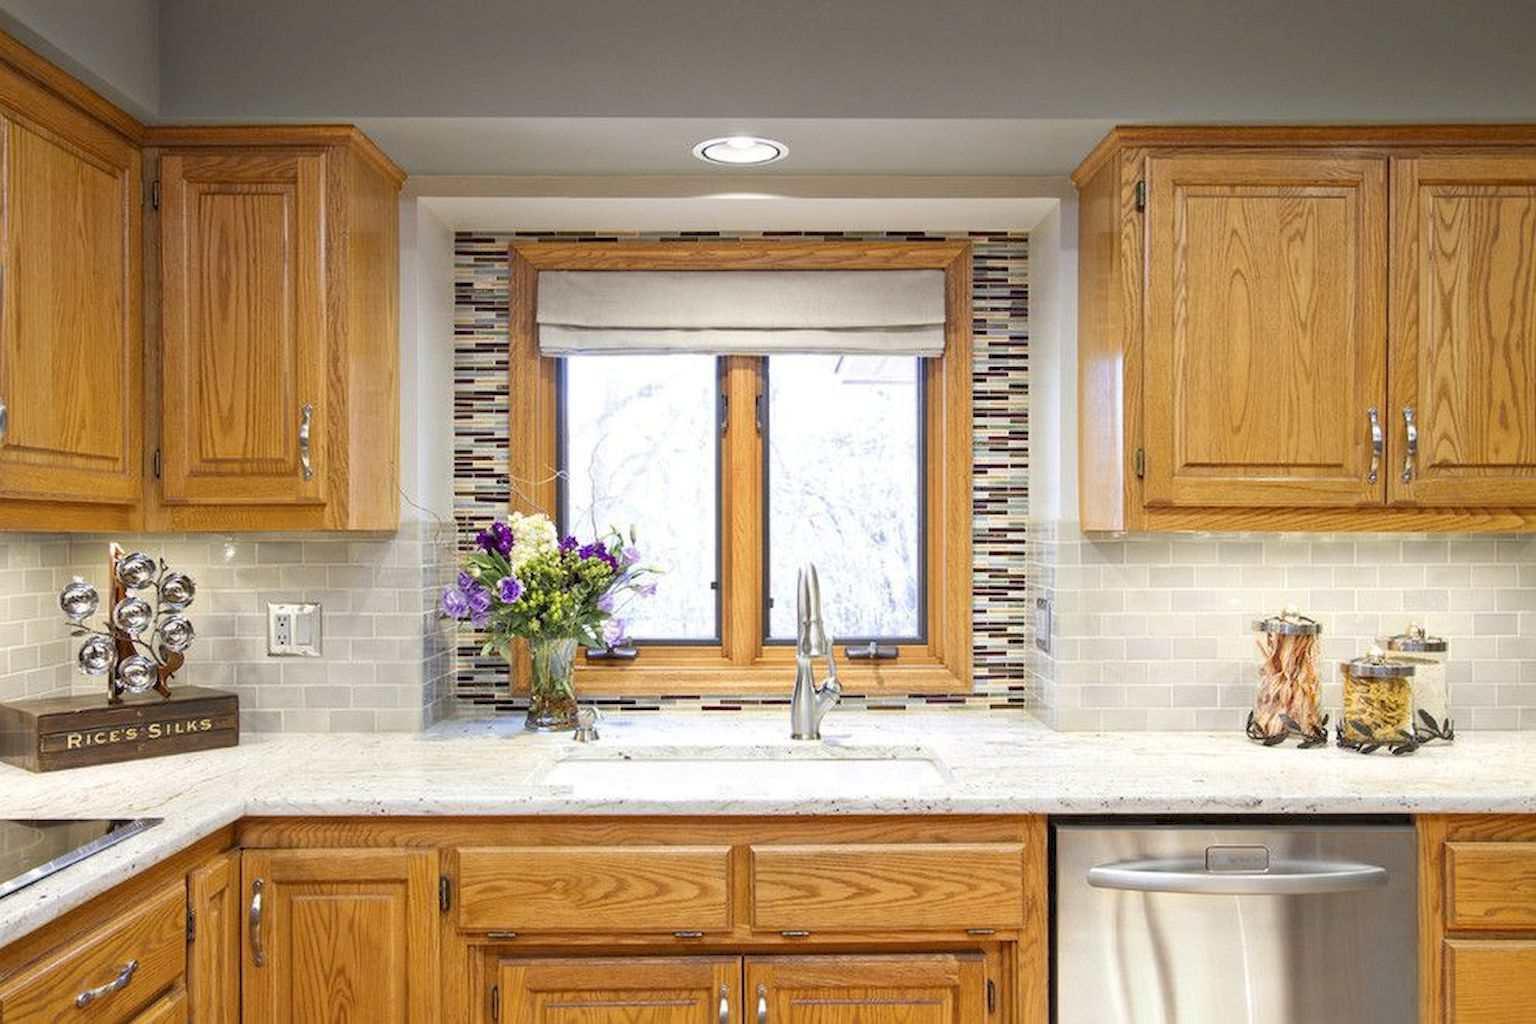 Oak cabinets with granite countertop